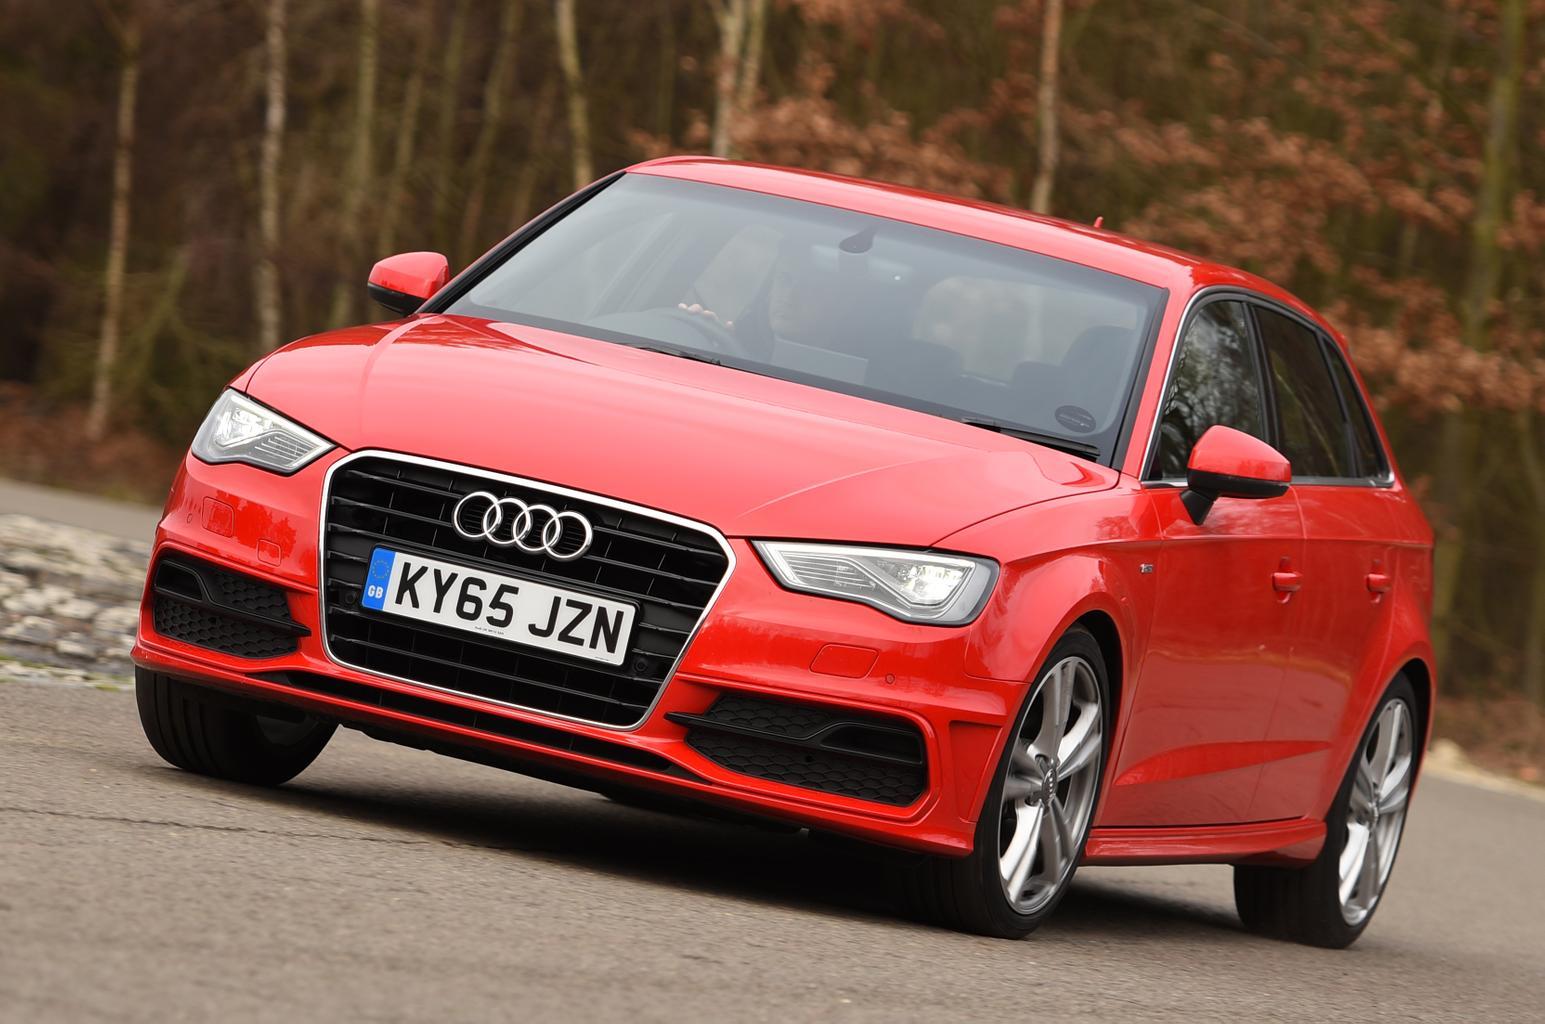 Audi A3 Sportback vs BMW 1 Series vs Infiniti Q30: Verdict